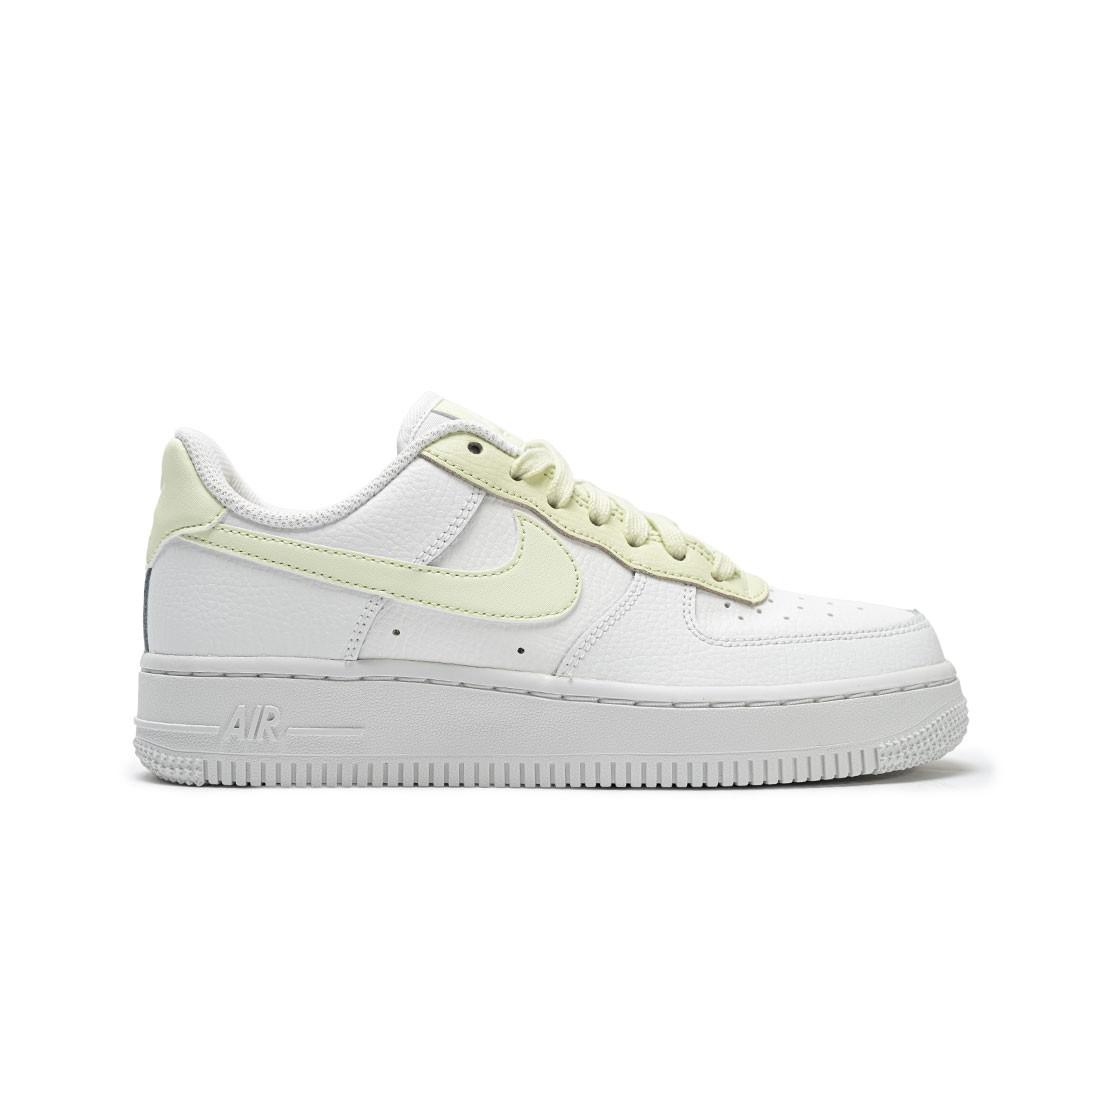 Nike Women Air Force 1 '07 (summit white / lime ice-summit white)